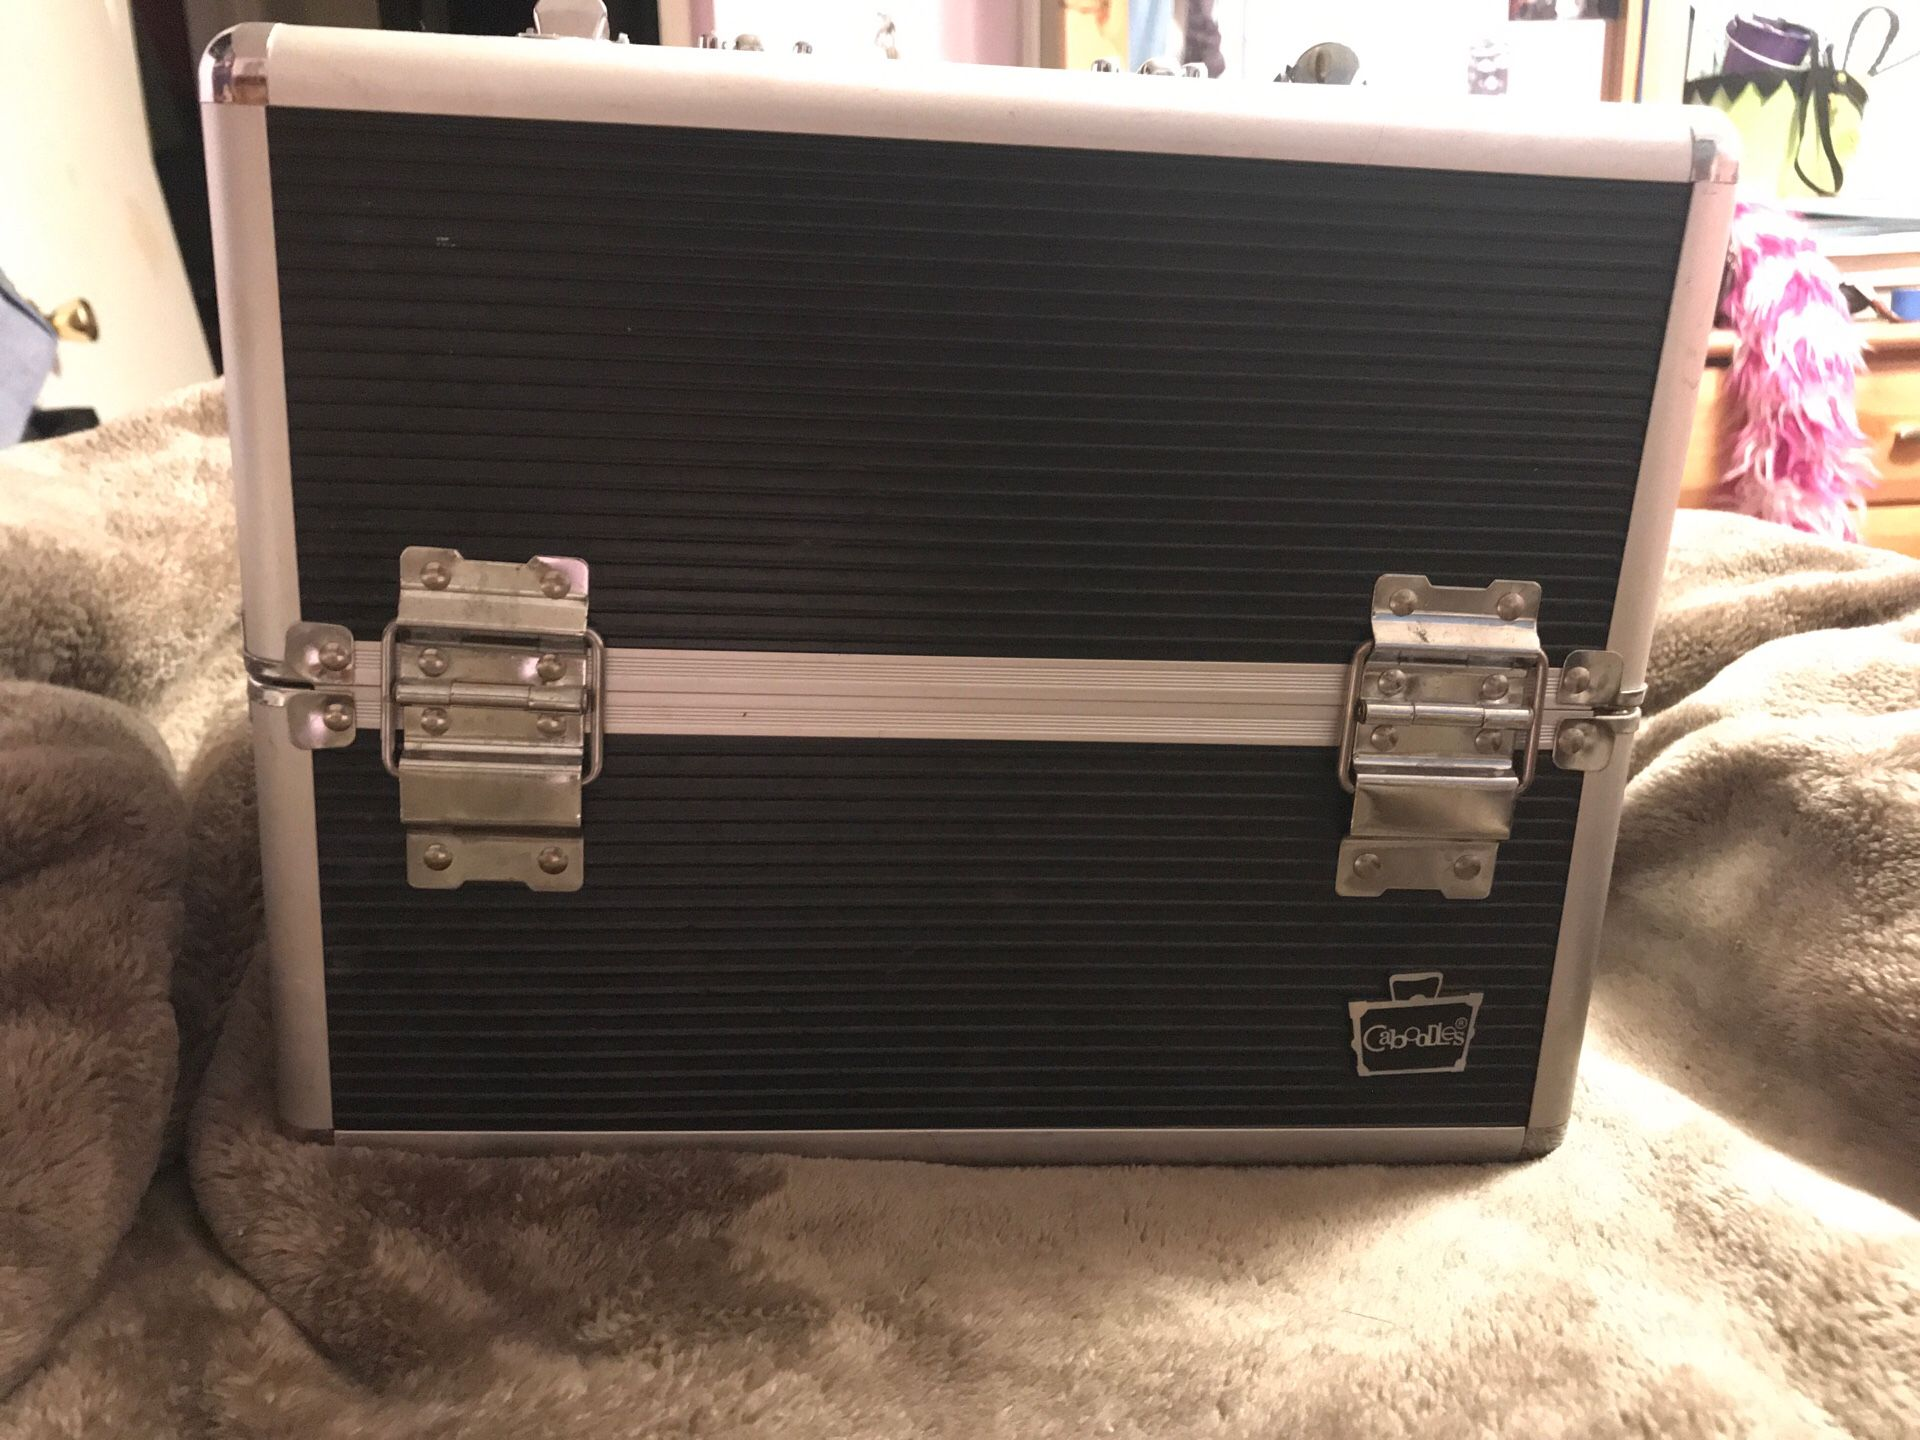 Caboodle Train Case